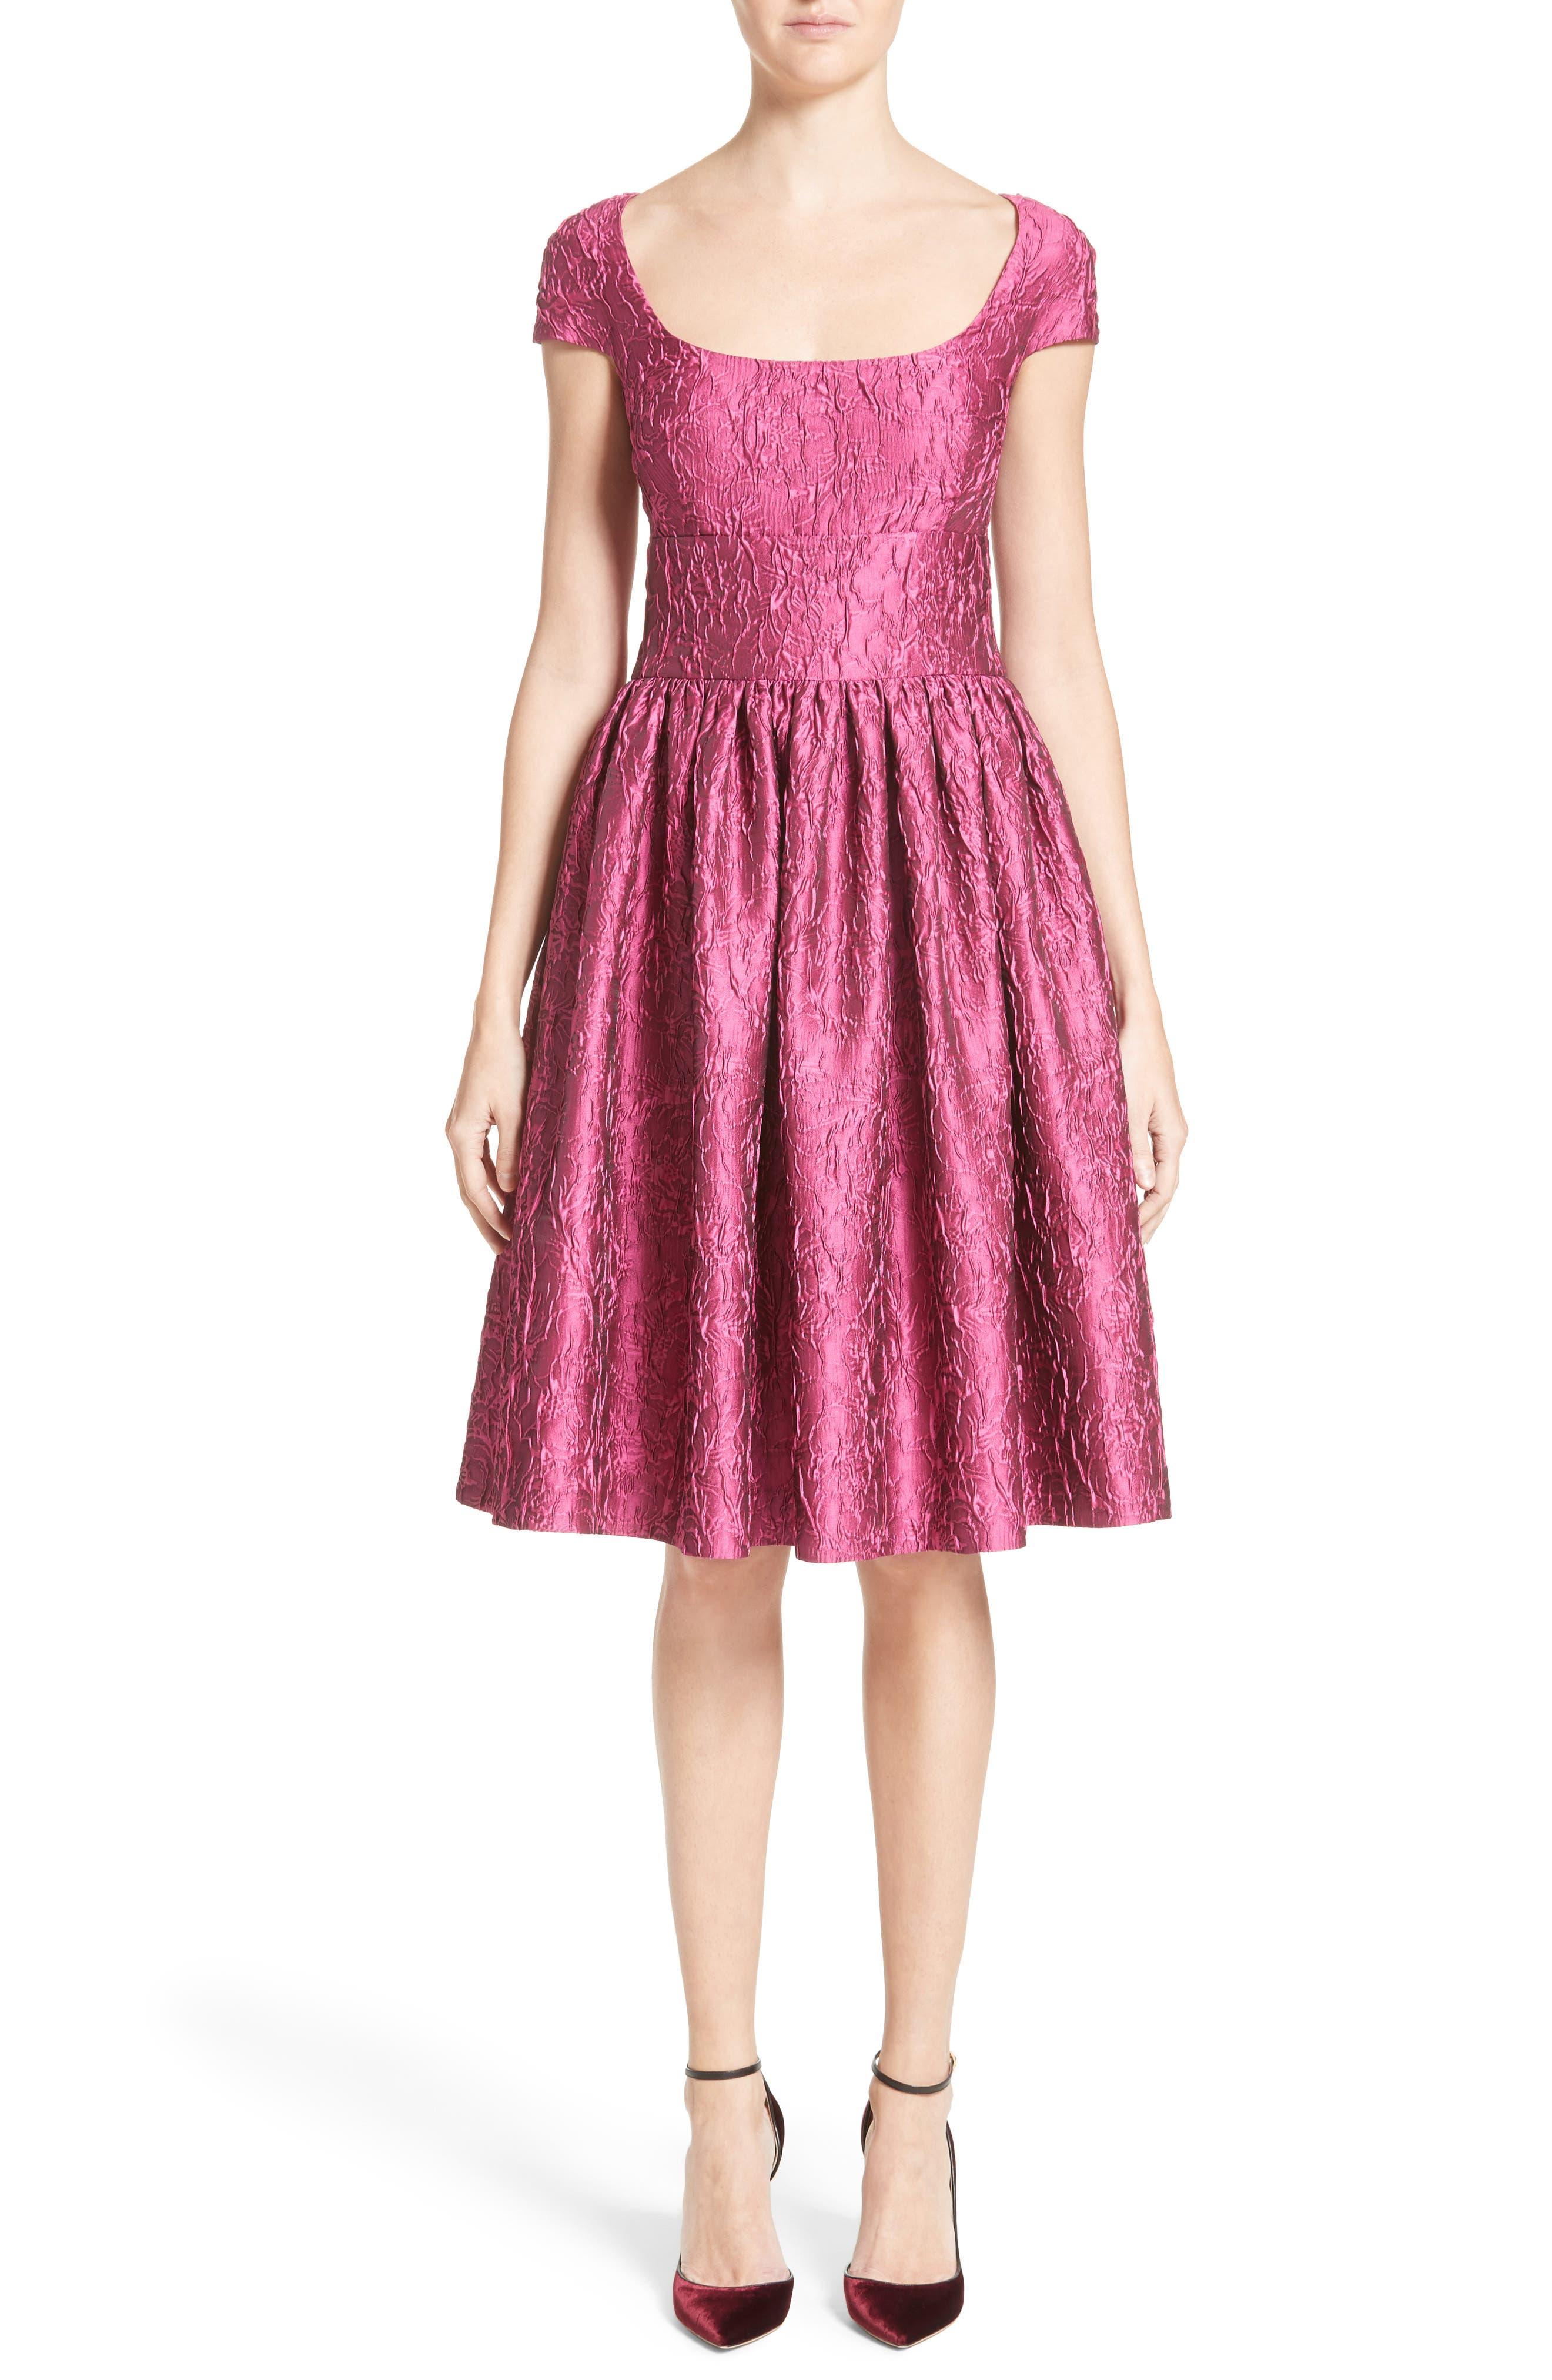 BADGLEY MISCHKA COUTURE., Badgley Mischka Couture Cap Sleeve Brocade Party Dress, Main thumbnail 1, color, 652